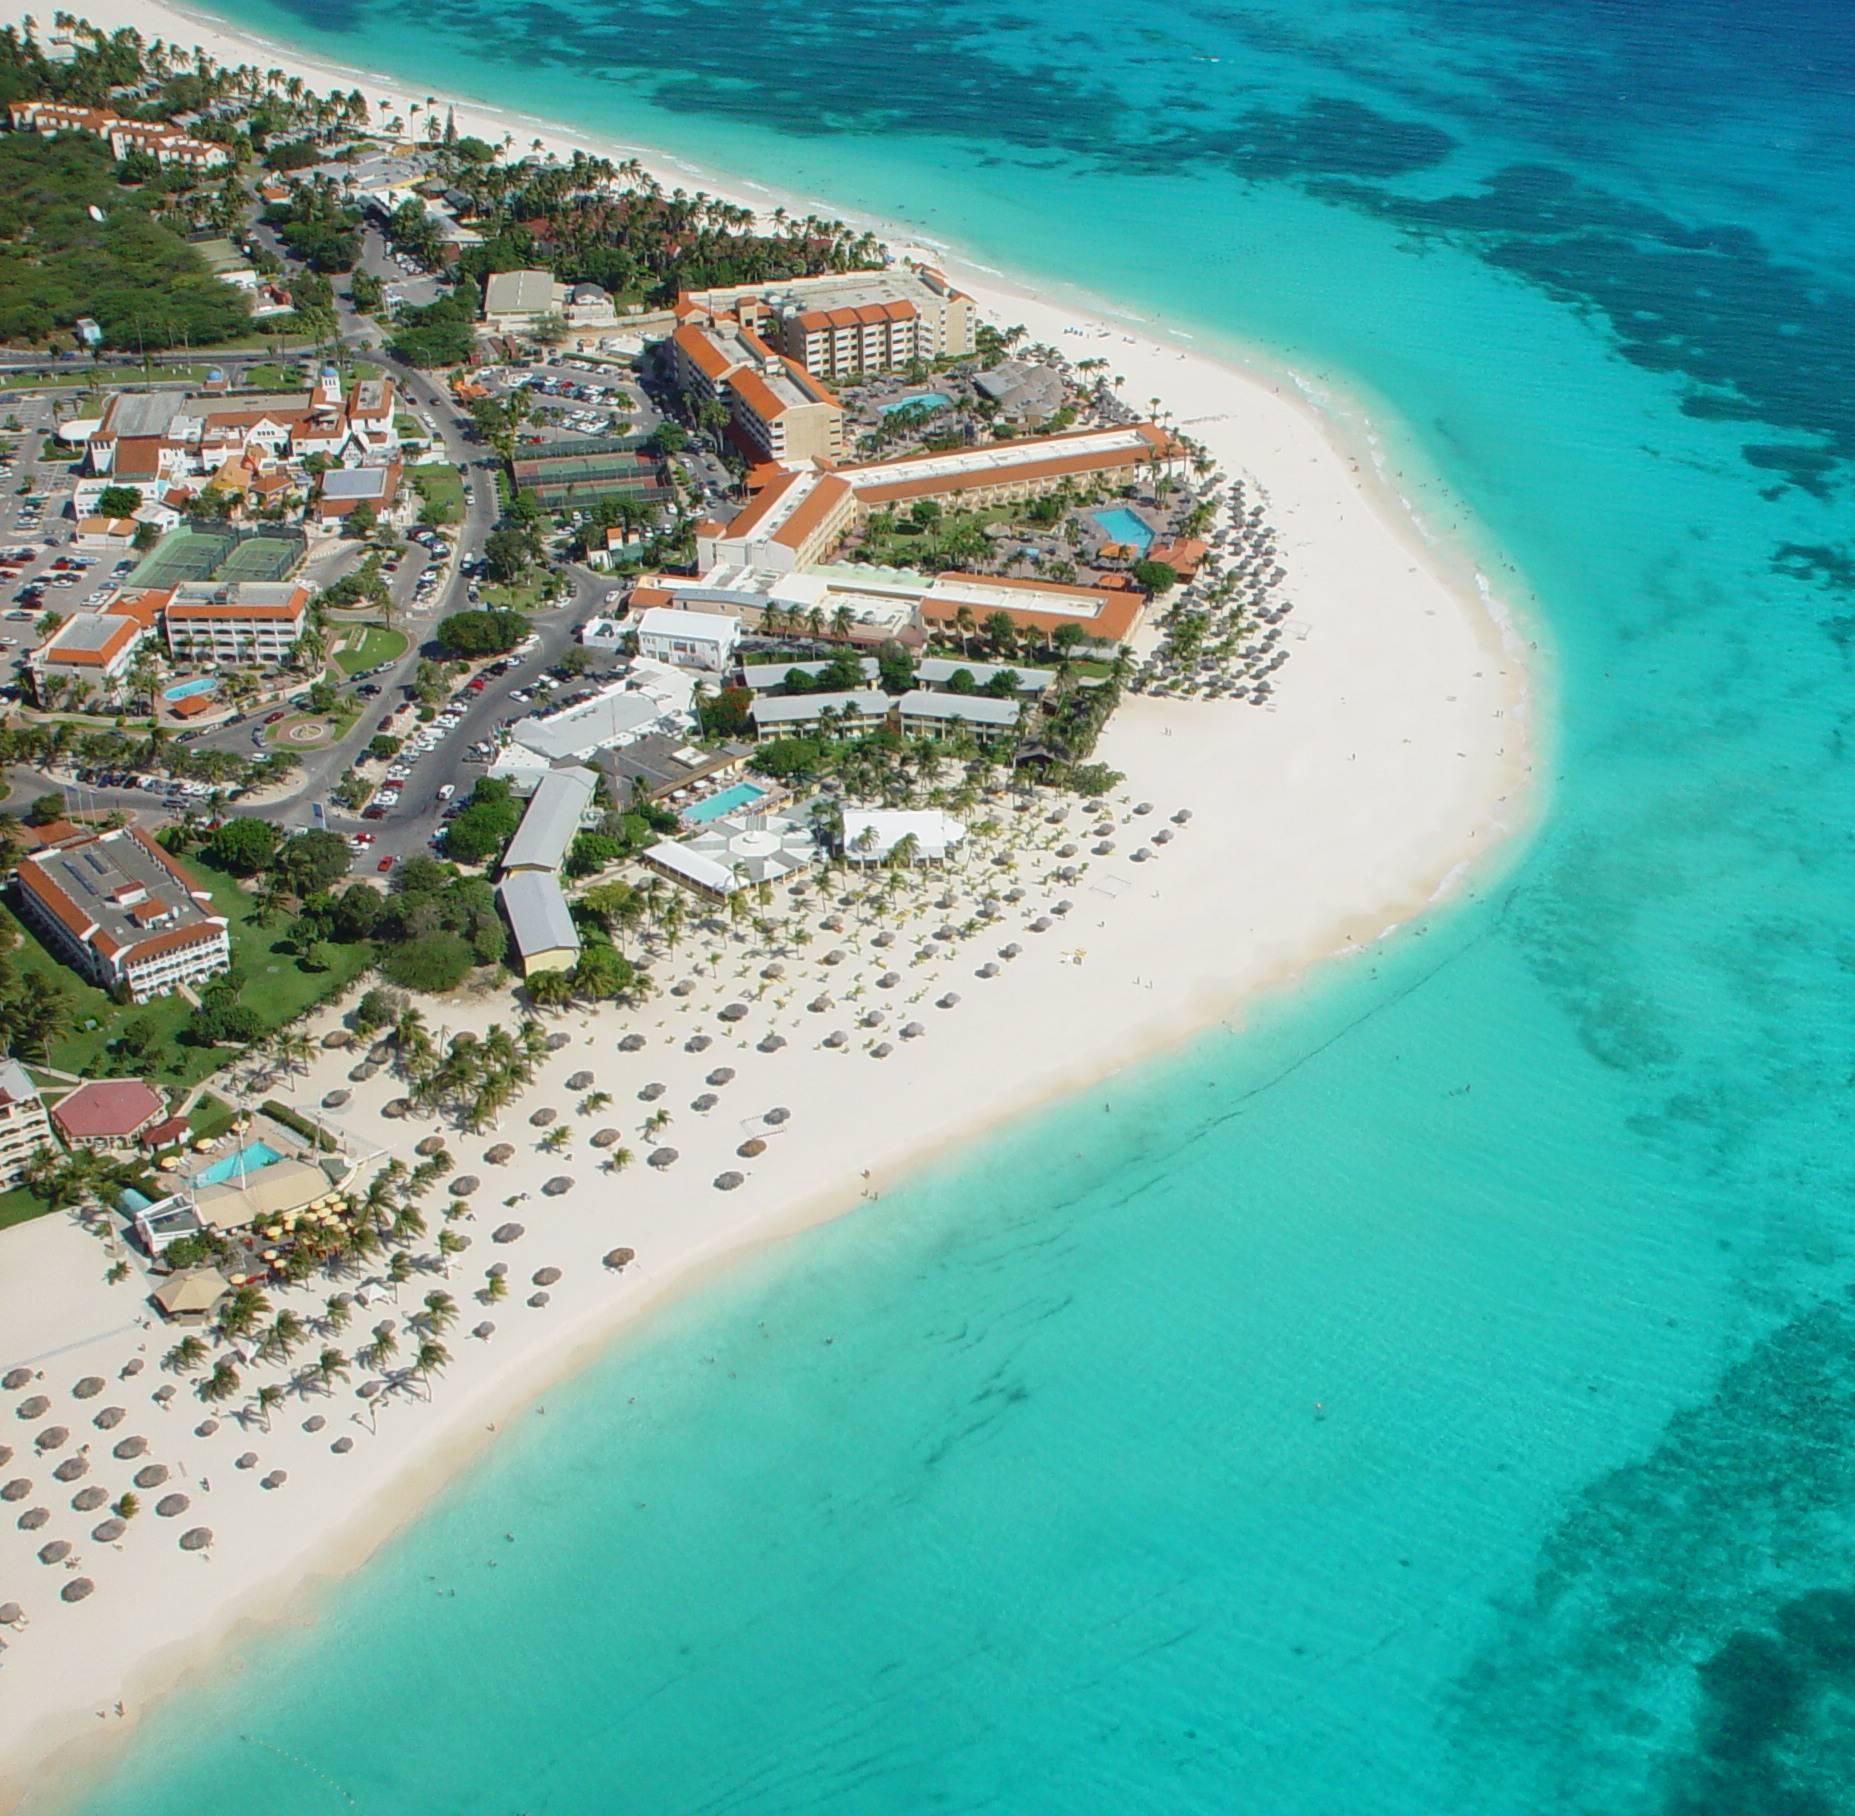 Caribbean: Best Beach Pictures